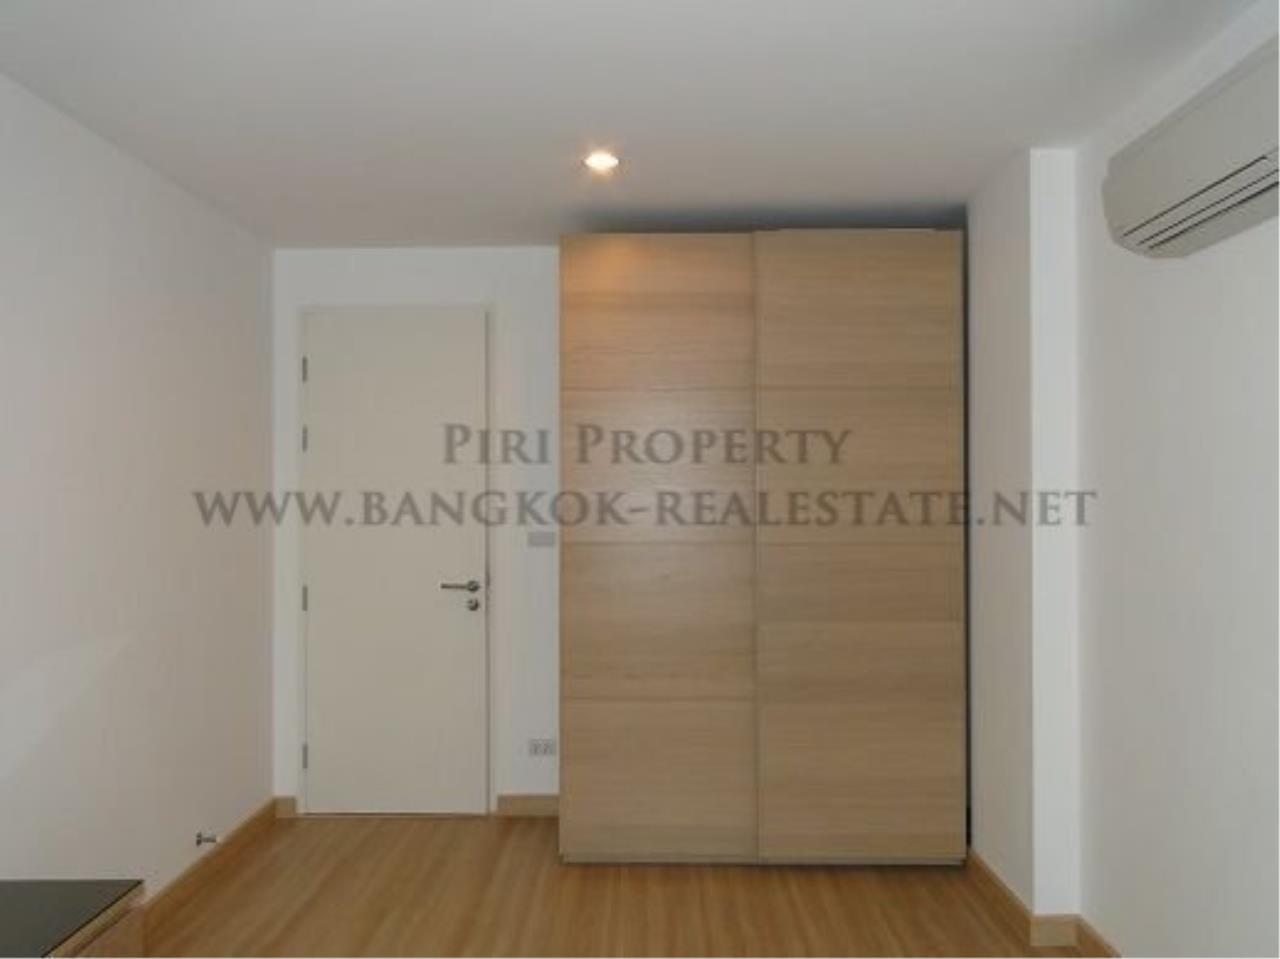 Piri Property Agency's 1 Bedroom Condo in The Voque Sukhumvit 16 building for Rent - 7th Floor 3